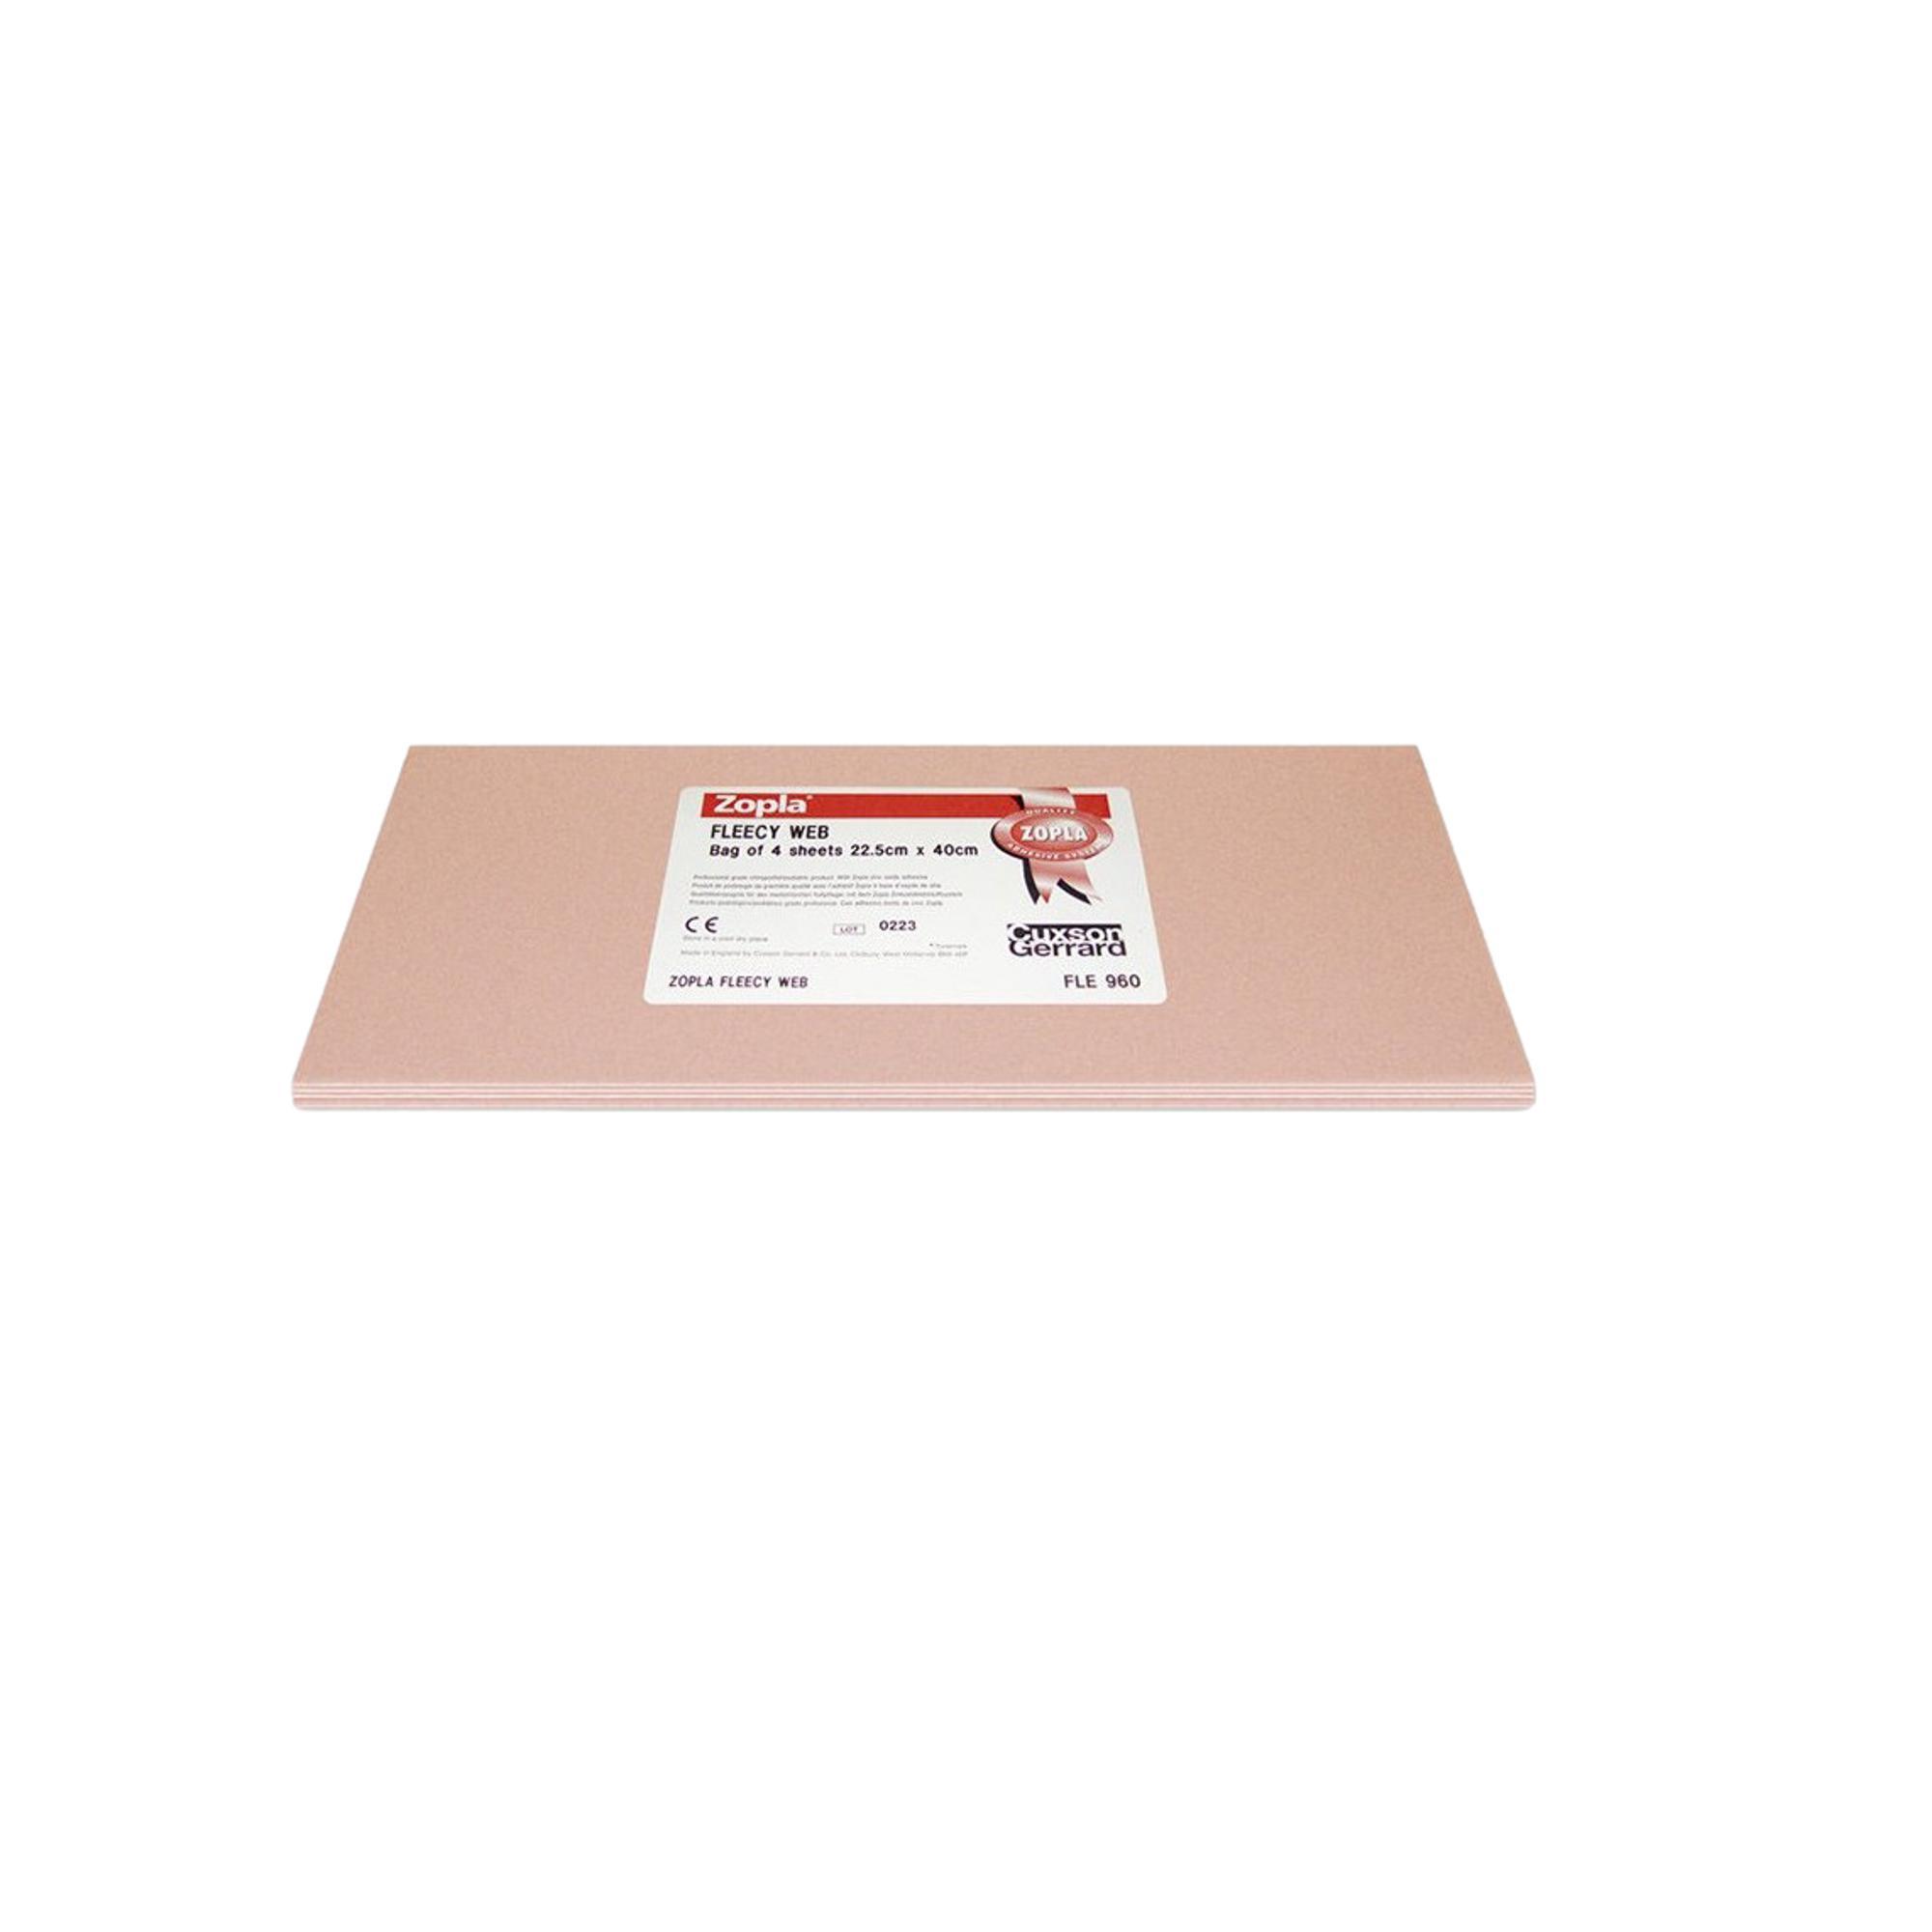 Zopla Fleecy Foam - Plaque de Bandage adhésif